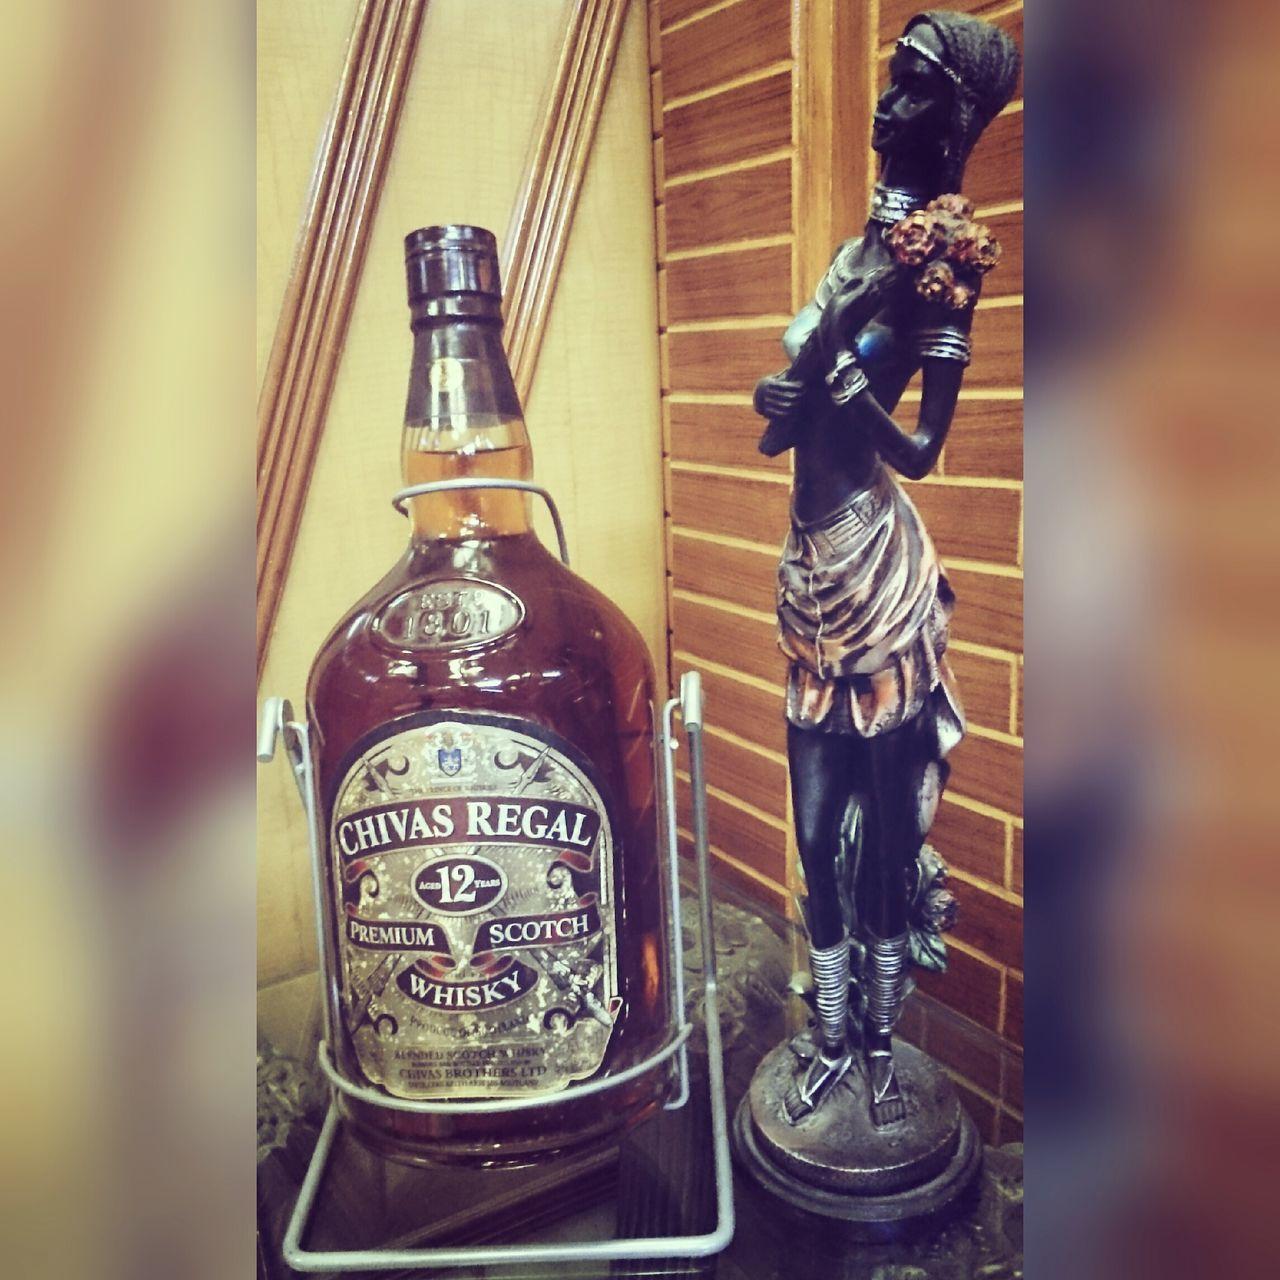 Chivas Regal 12 Years Blacklady Marvellous